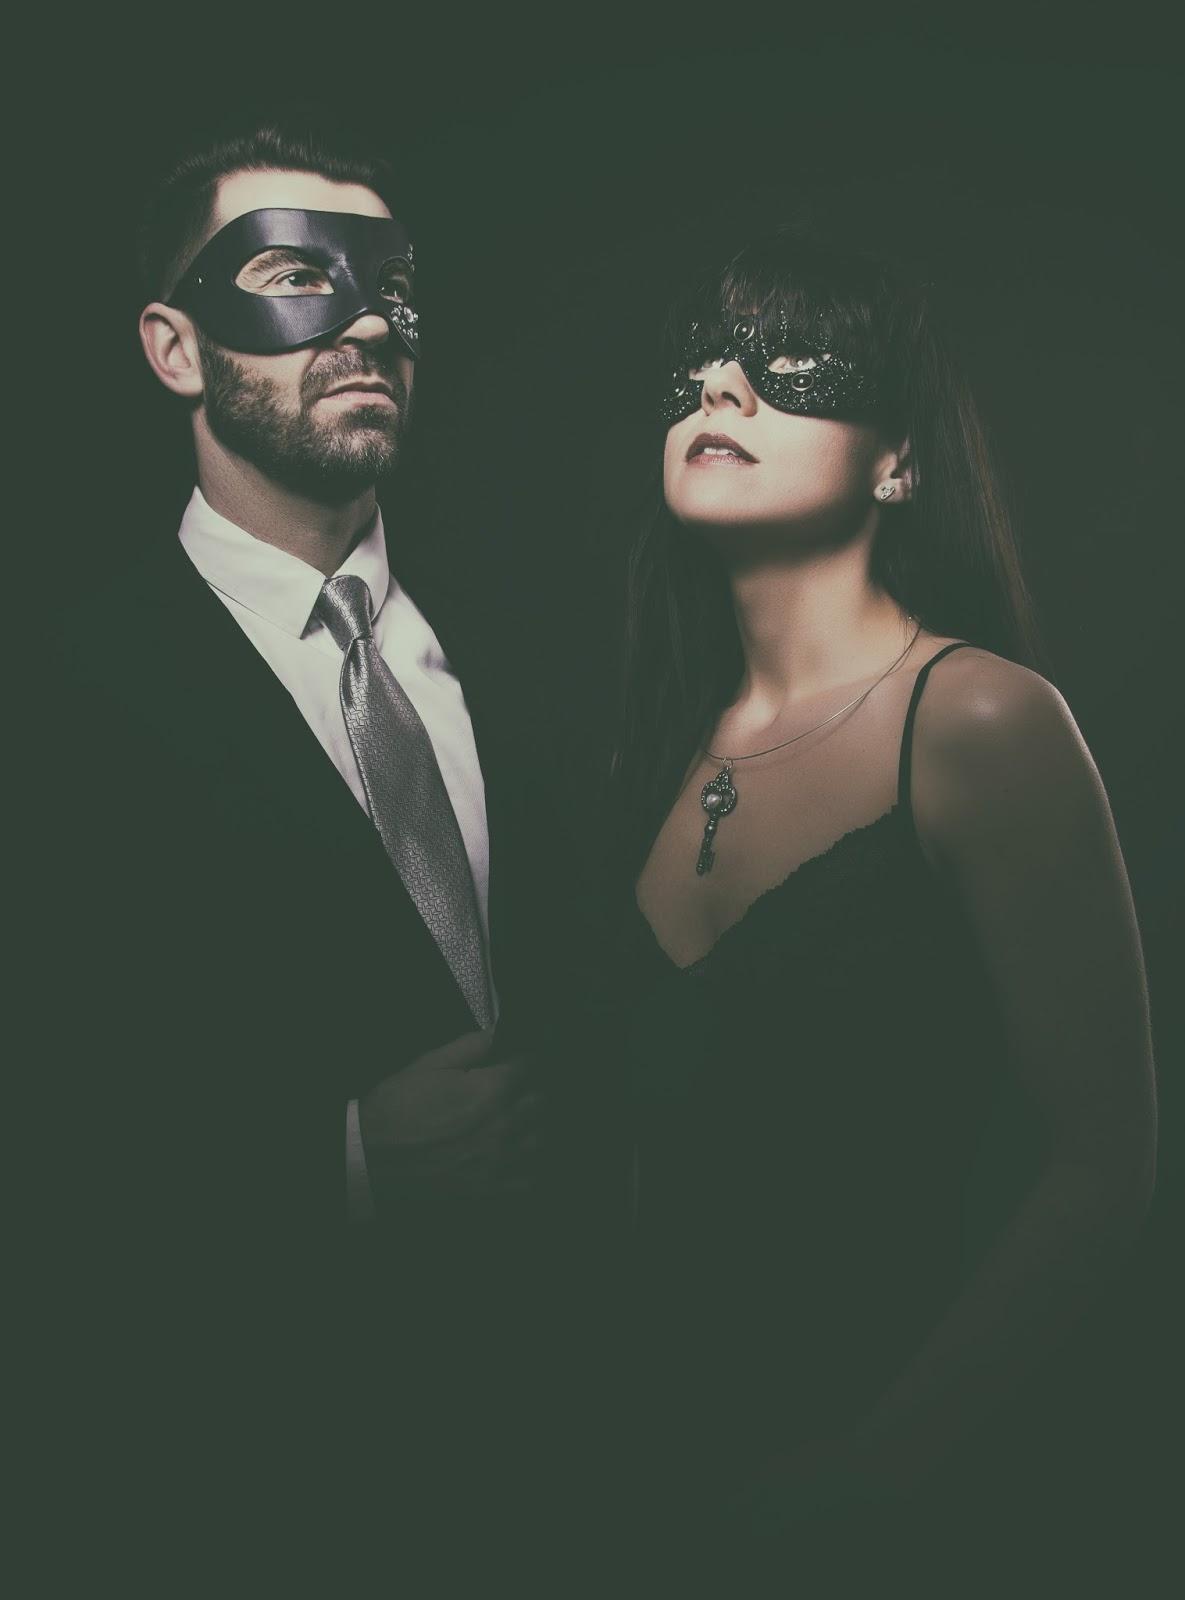 Mystic Magic, Shades Of Grey, fifty shades, fifty shades of grey, Lee Woodward Photography, photo, photography, fashion, high fashion photography, fetish, high fashion, fashion photo, dark beauty, photo shoot, masks, masquerade, mask photography